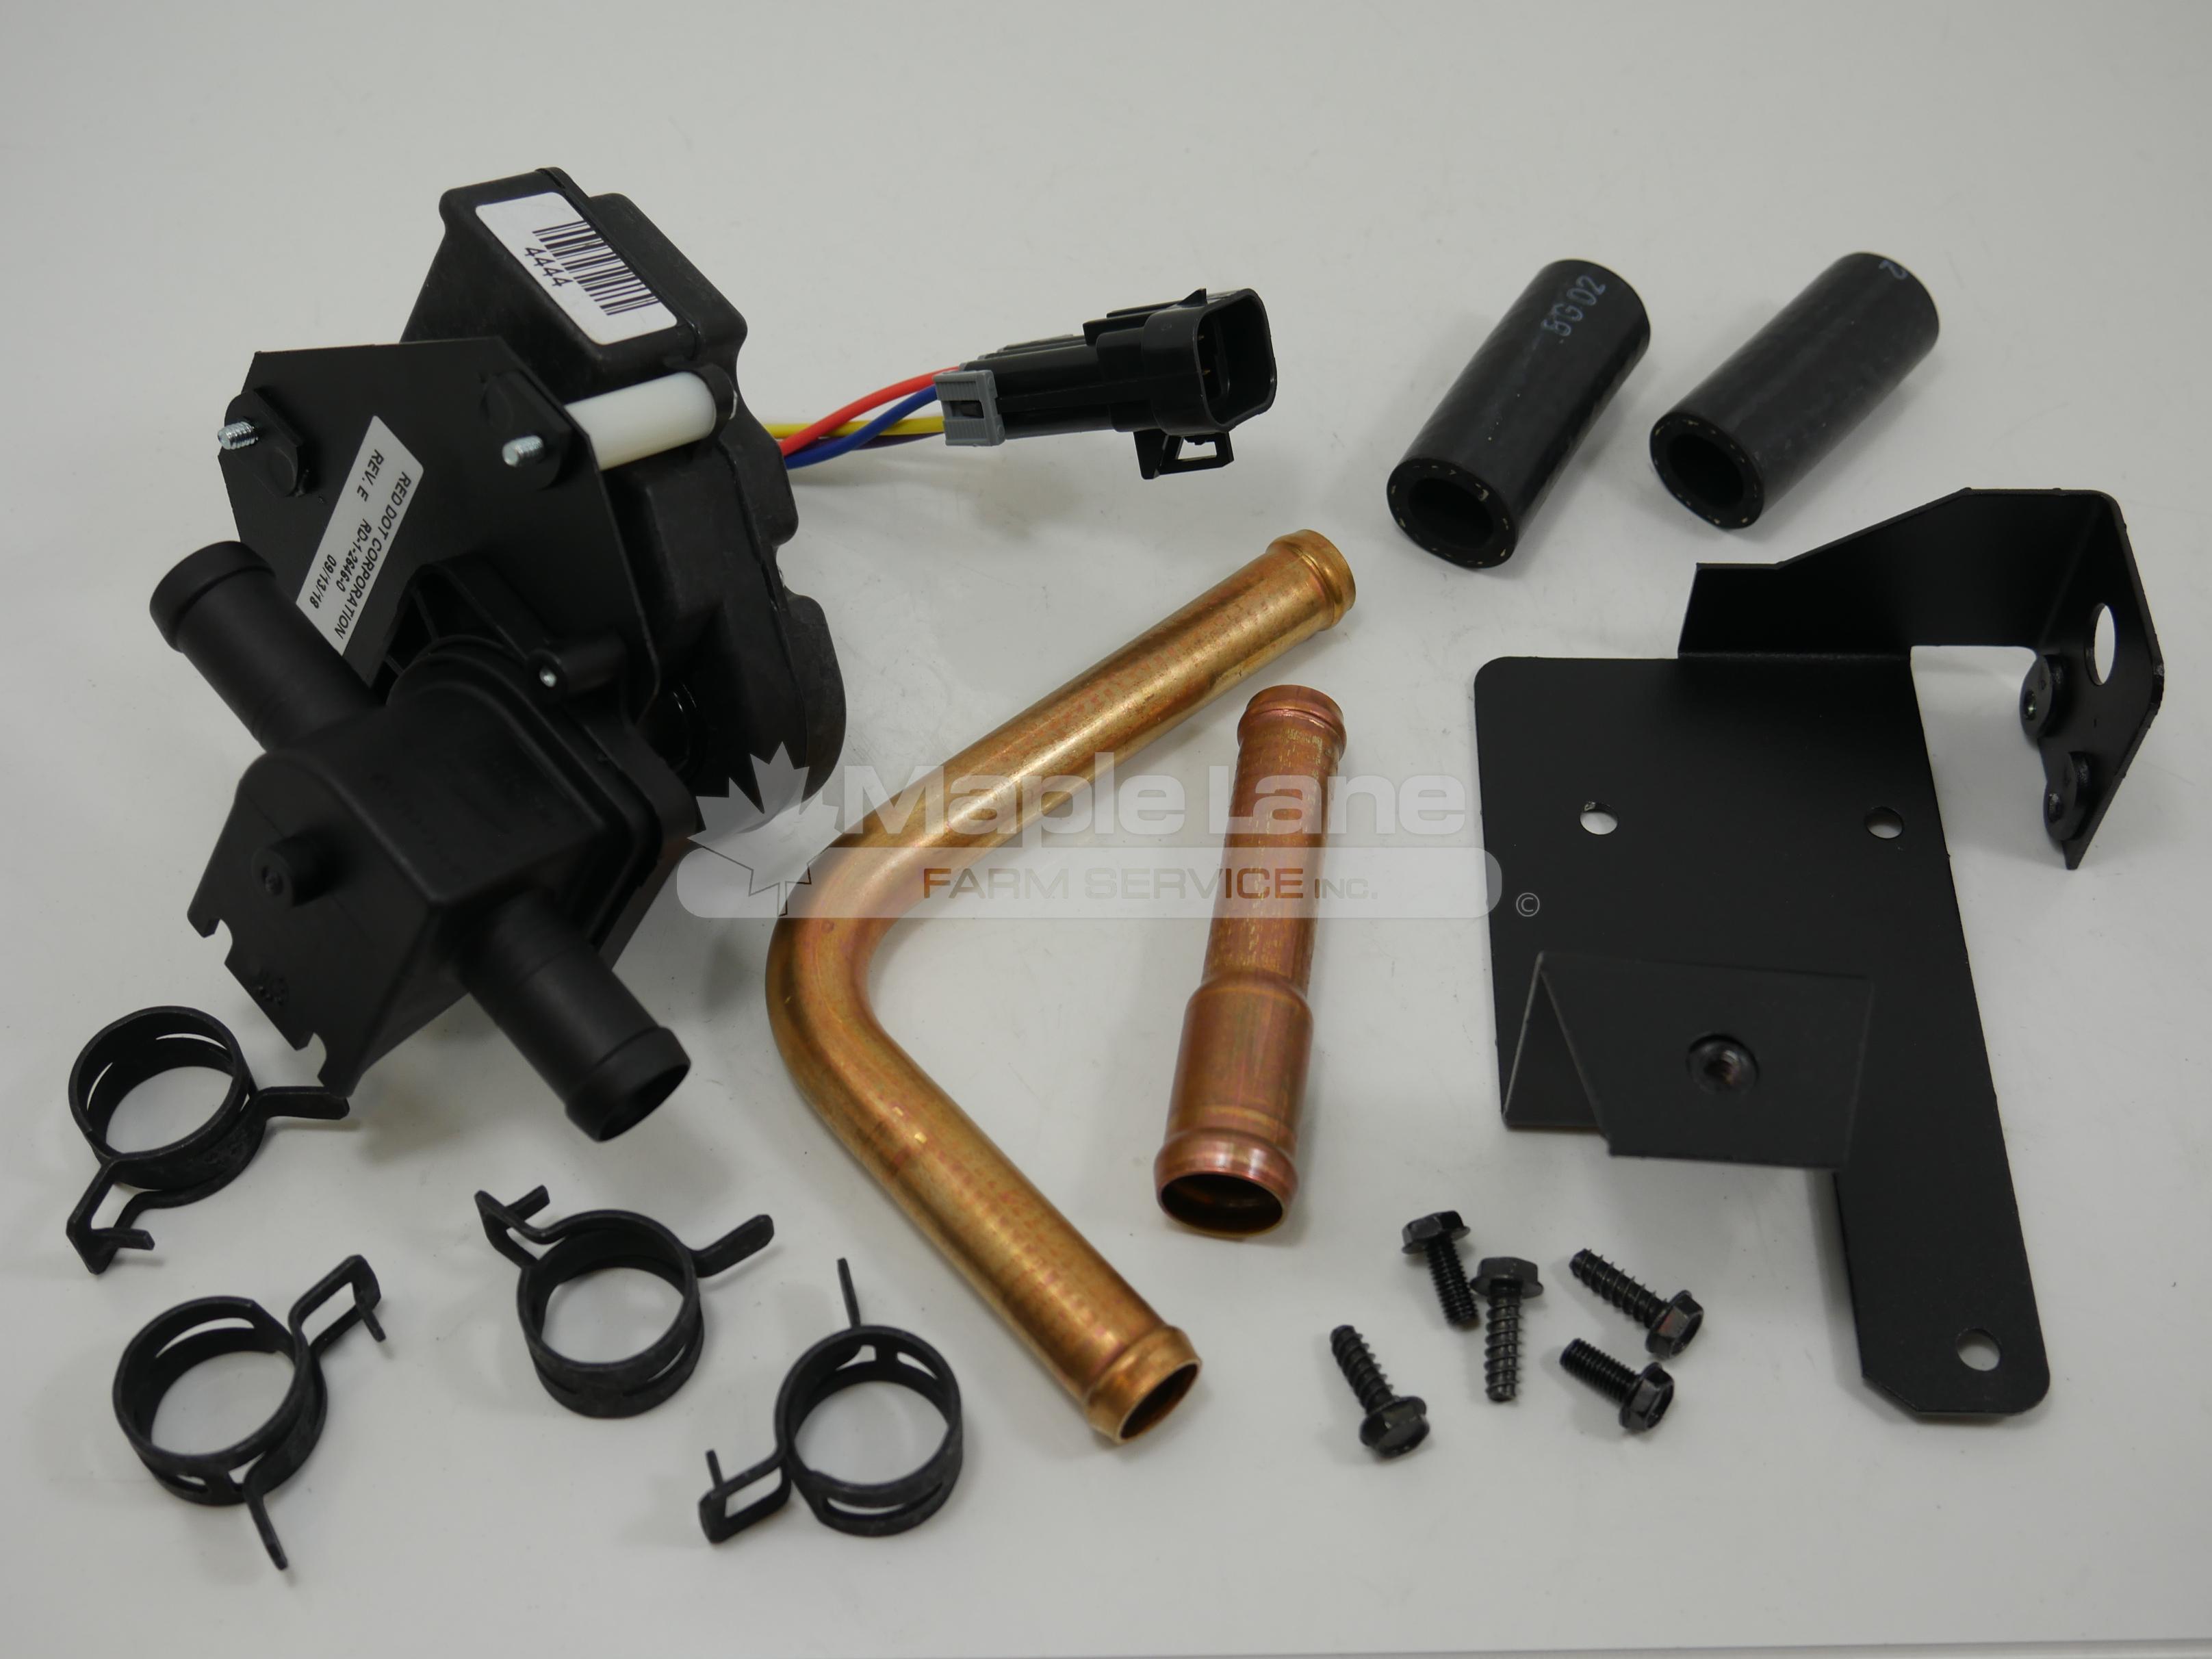 503578d2 valve kit